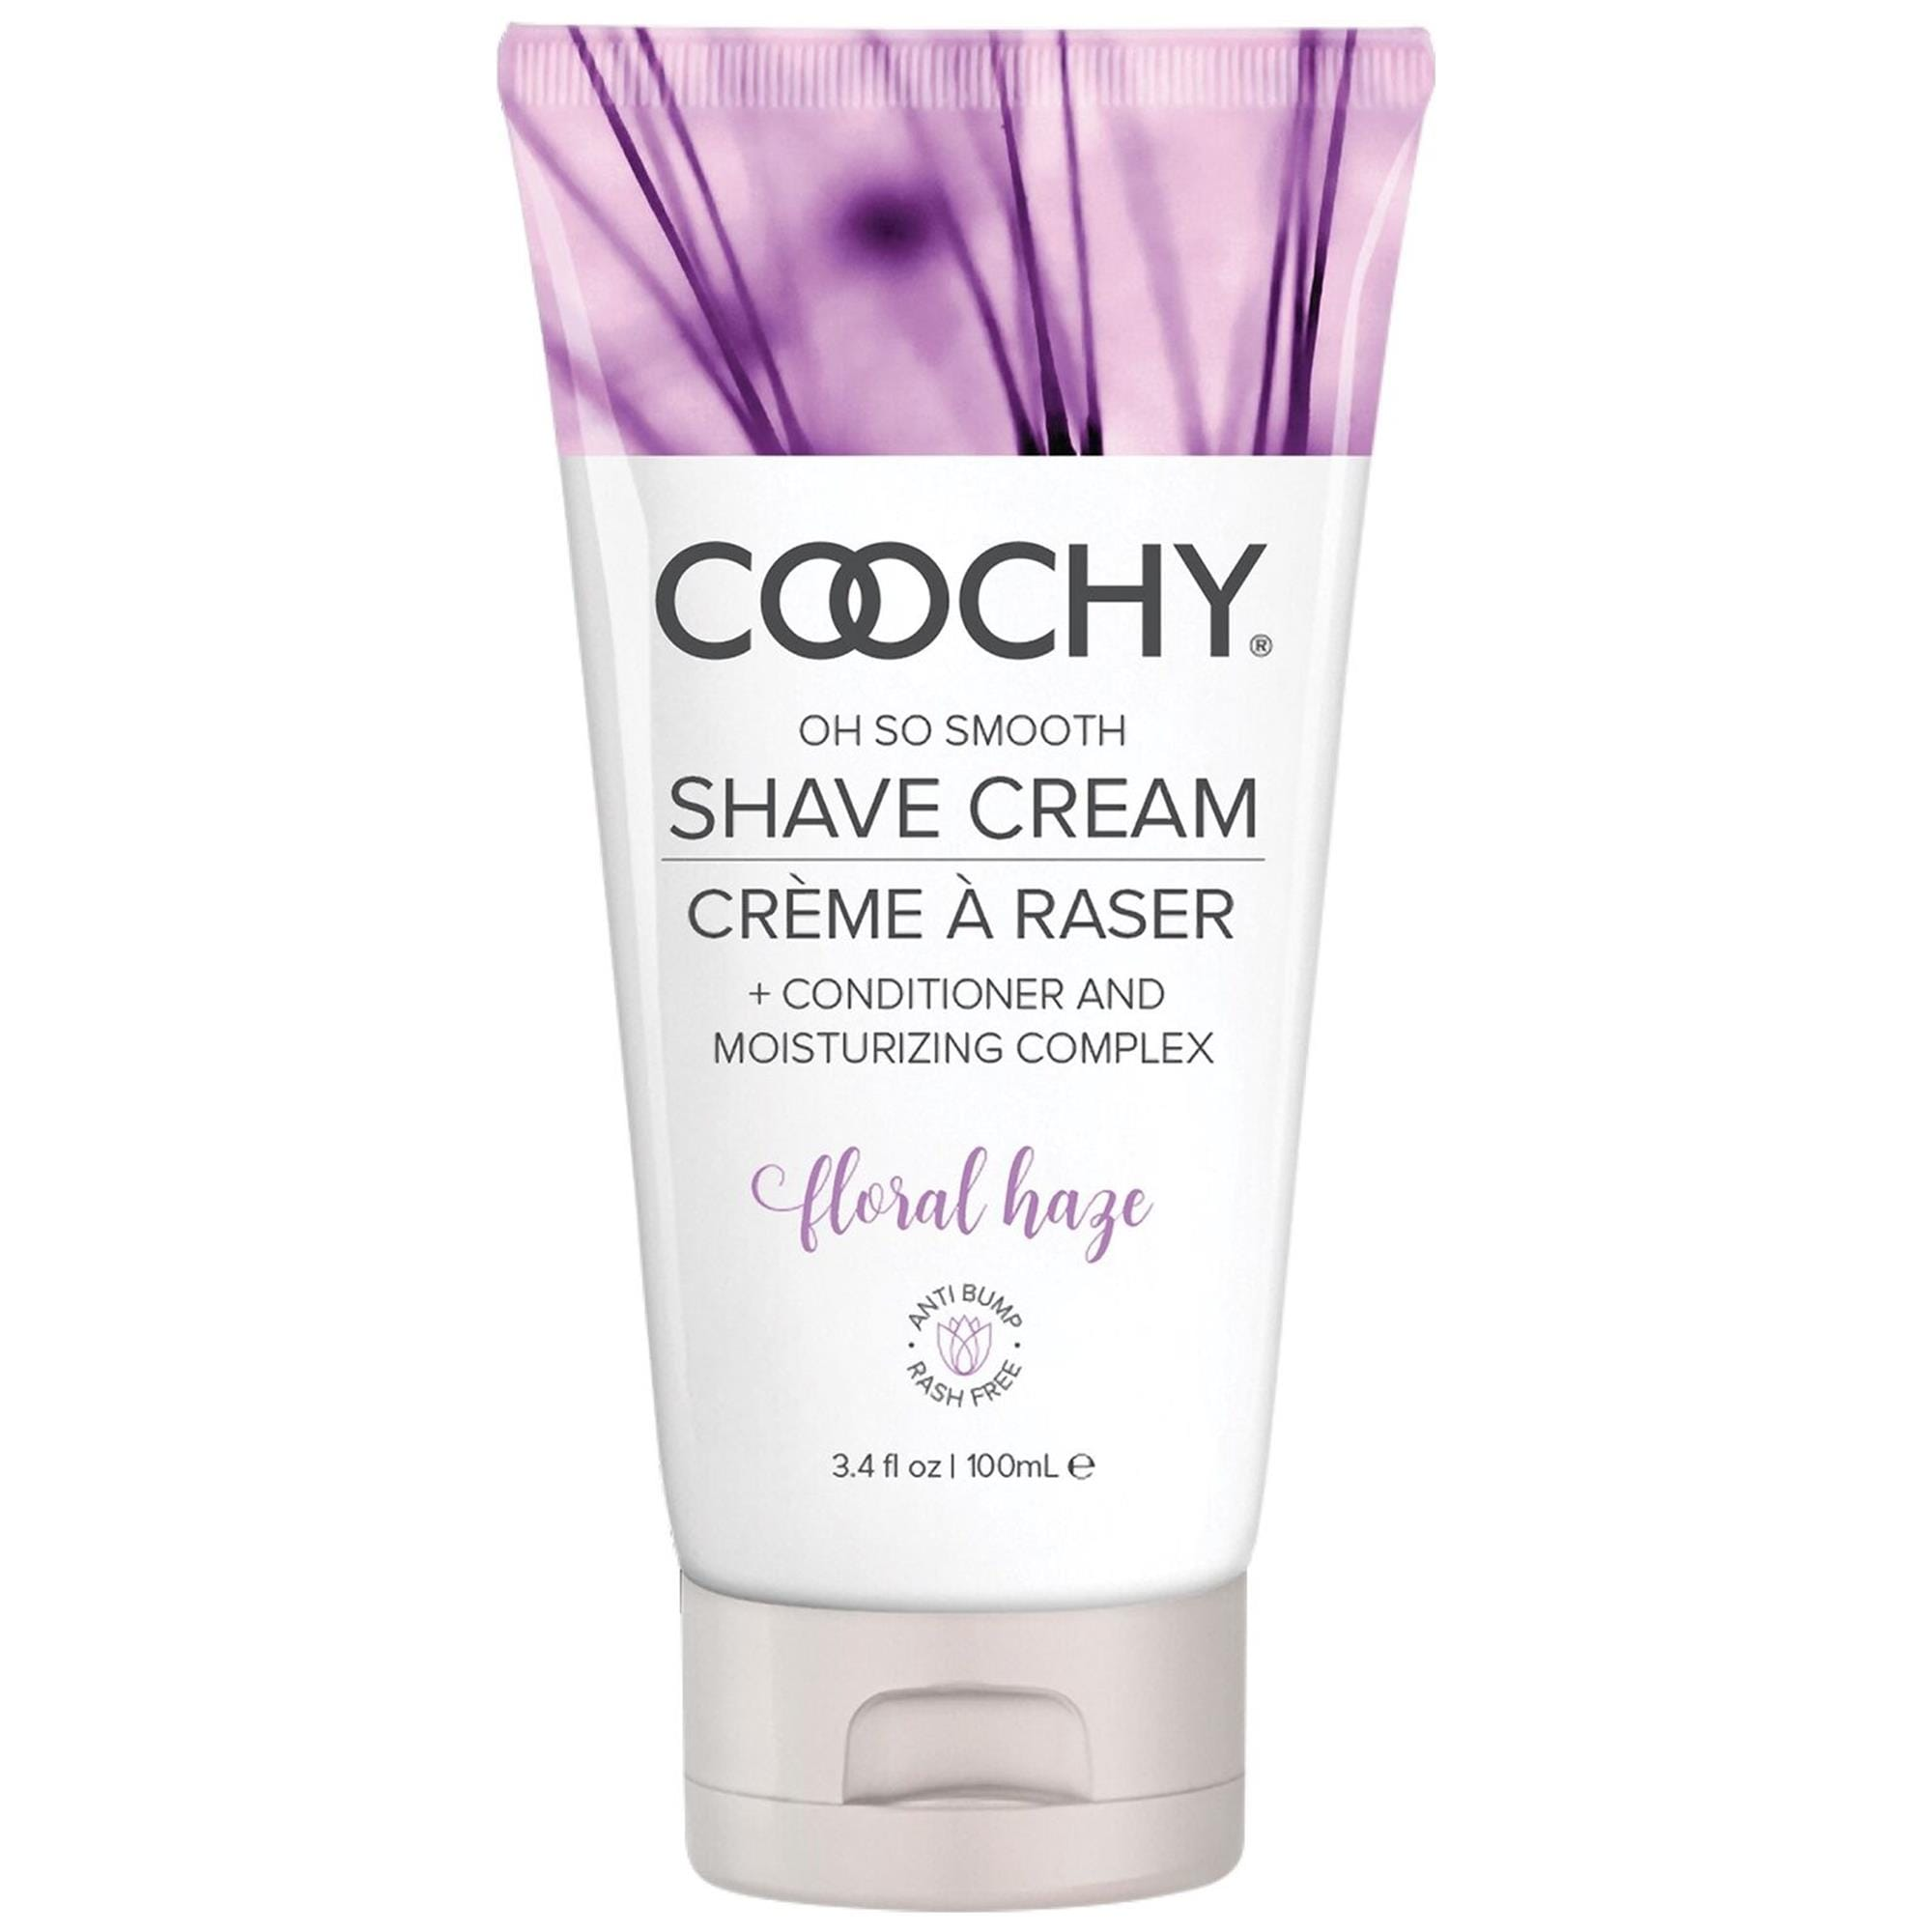 Coochy Shave Cream Floral Haze 100 ml   Apotek, Intimhygien, Intimrakning   Intimast.se - Sexleksaker